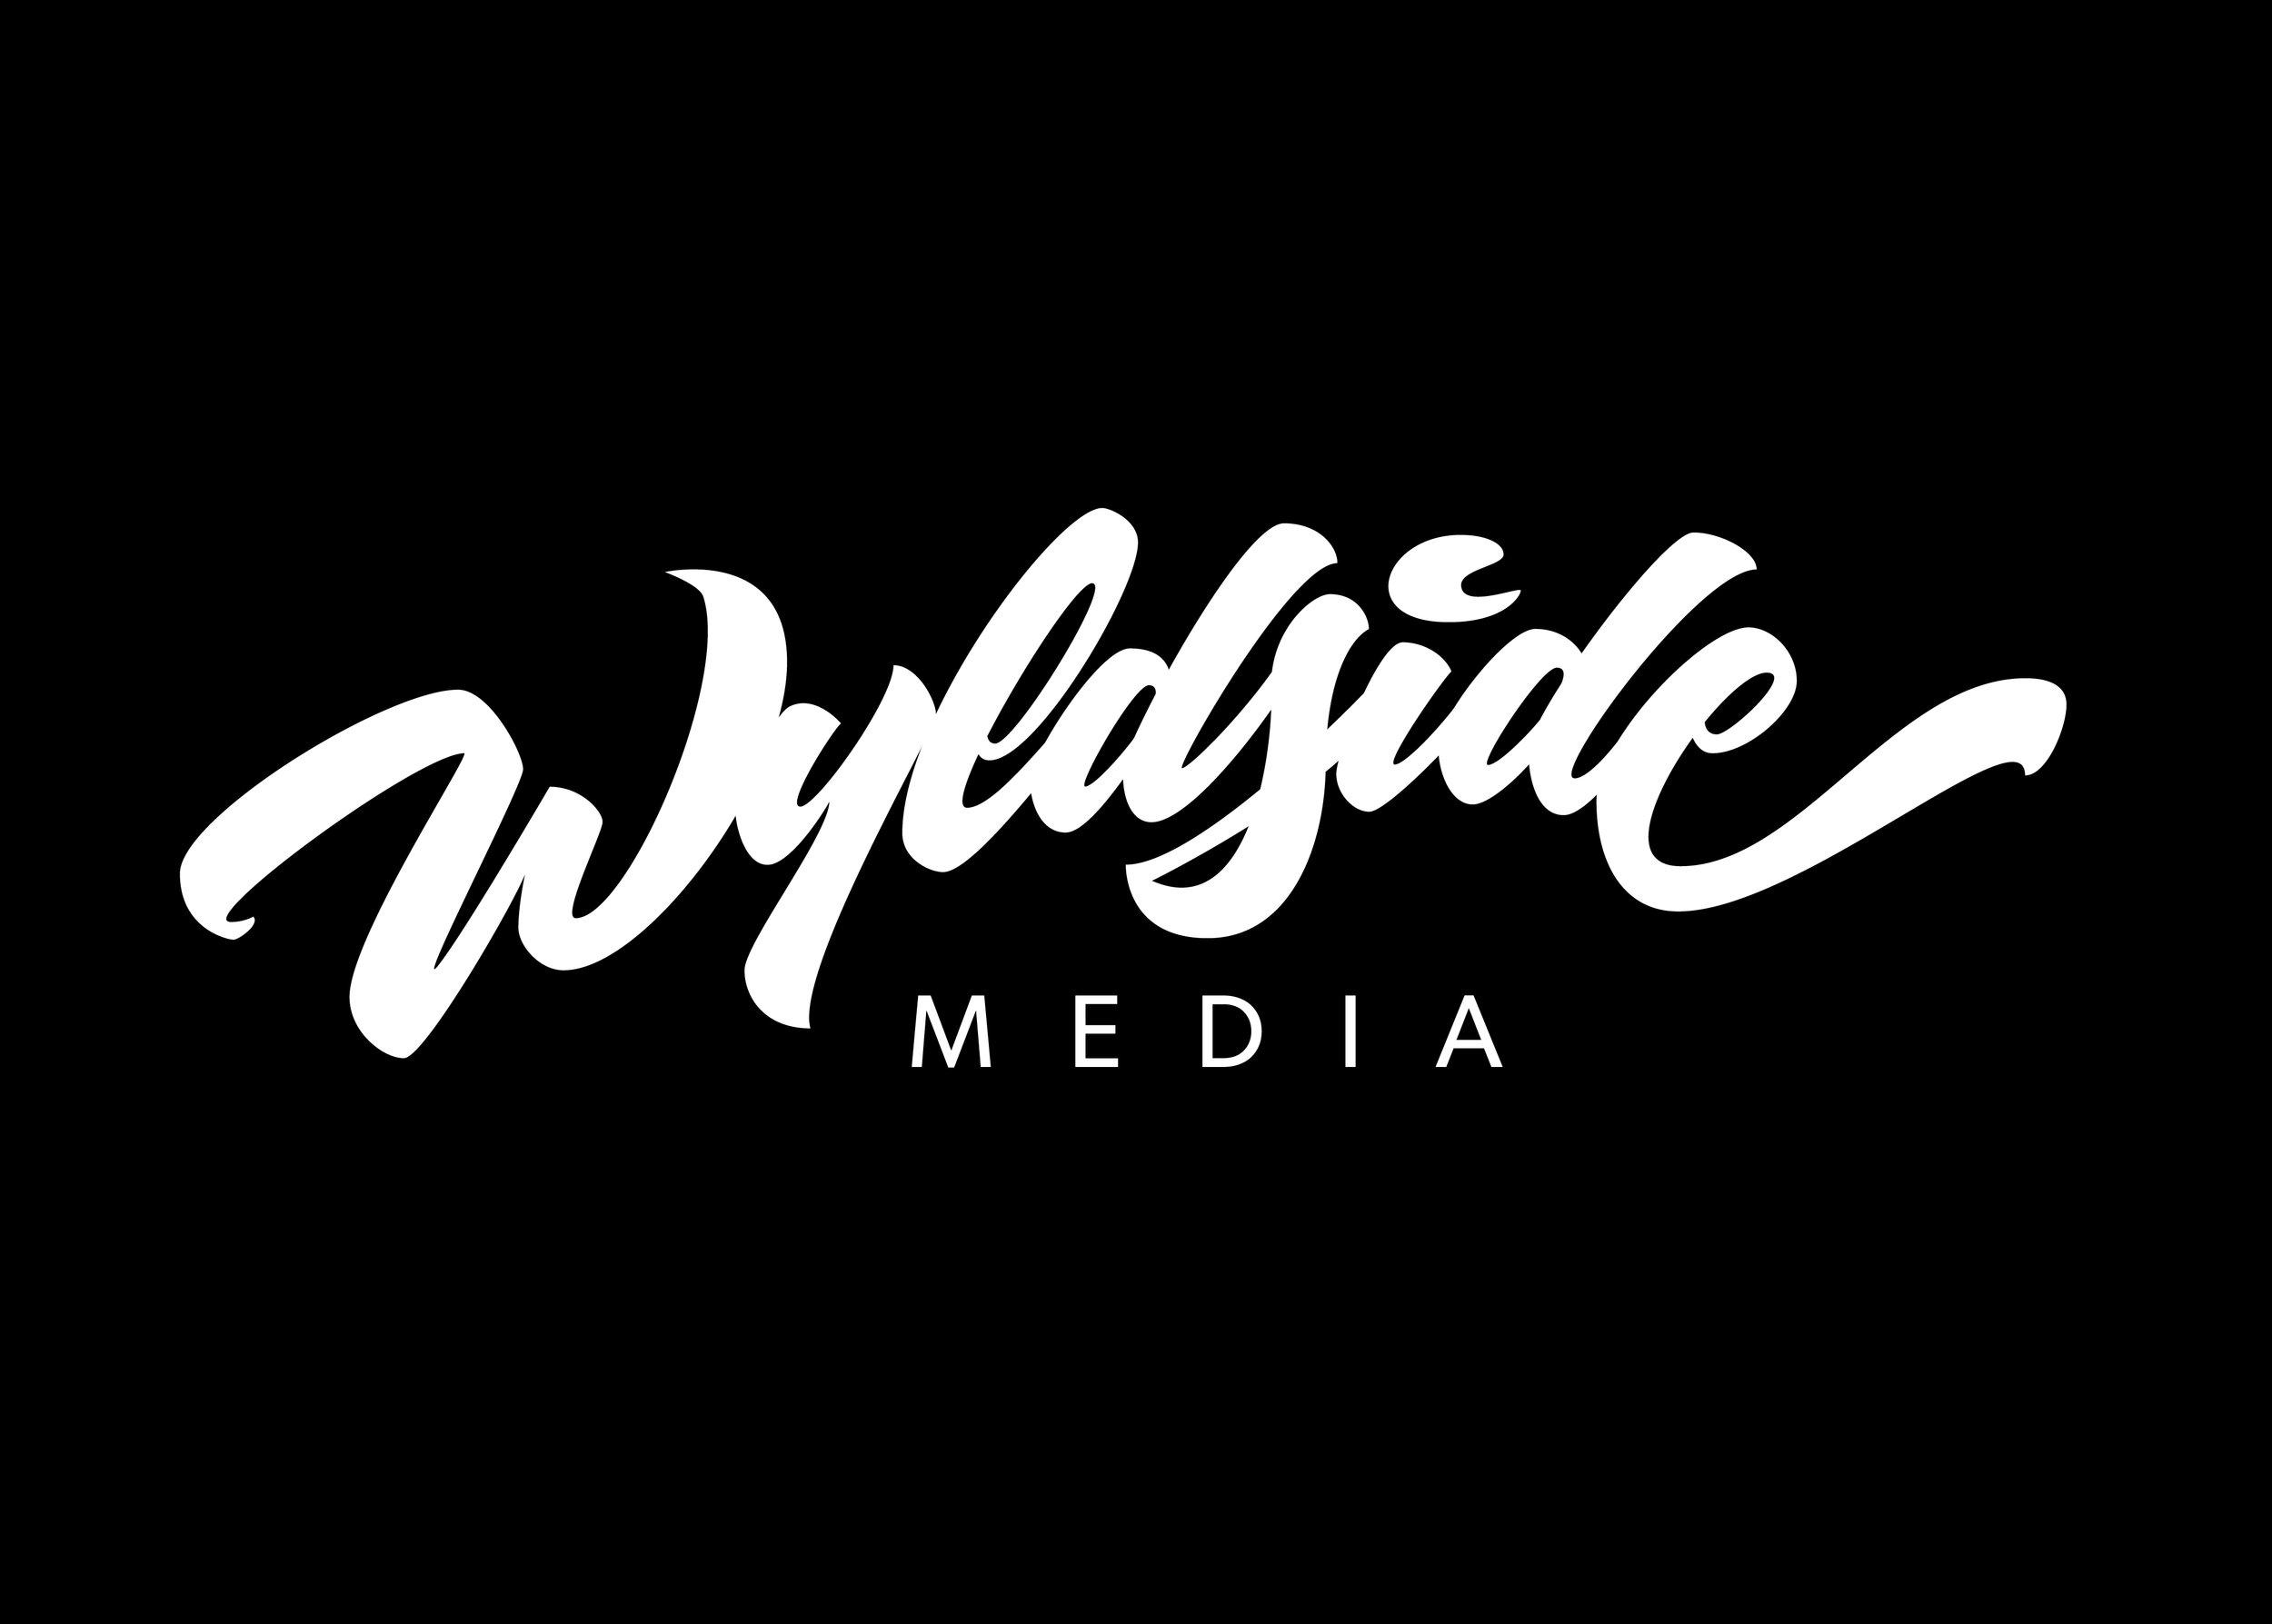 Wyldside Media